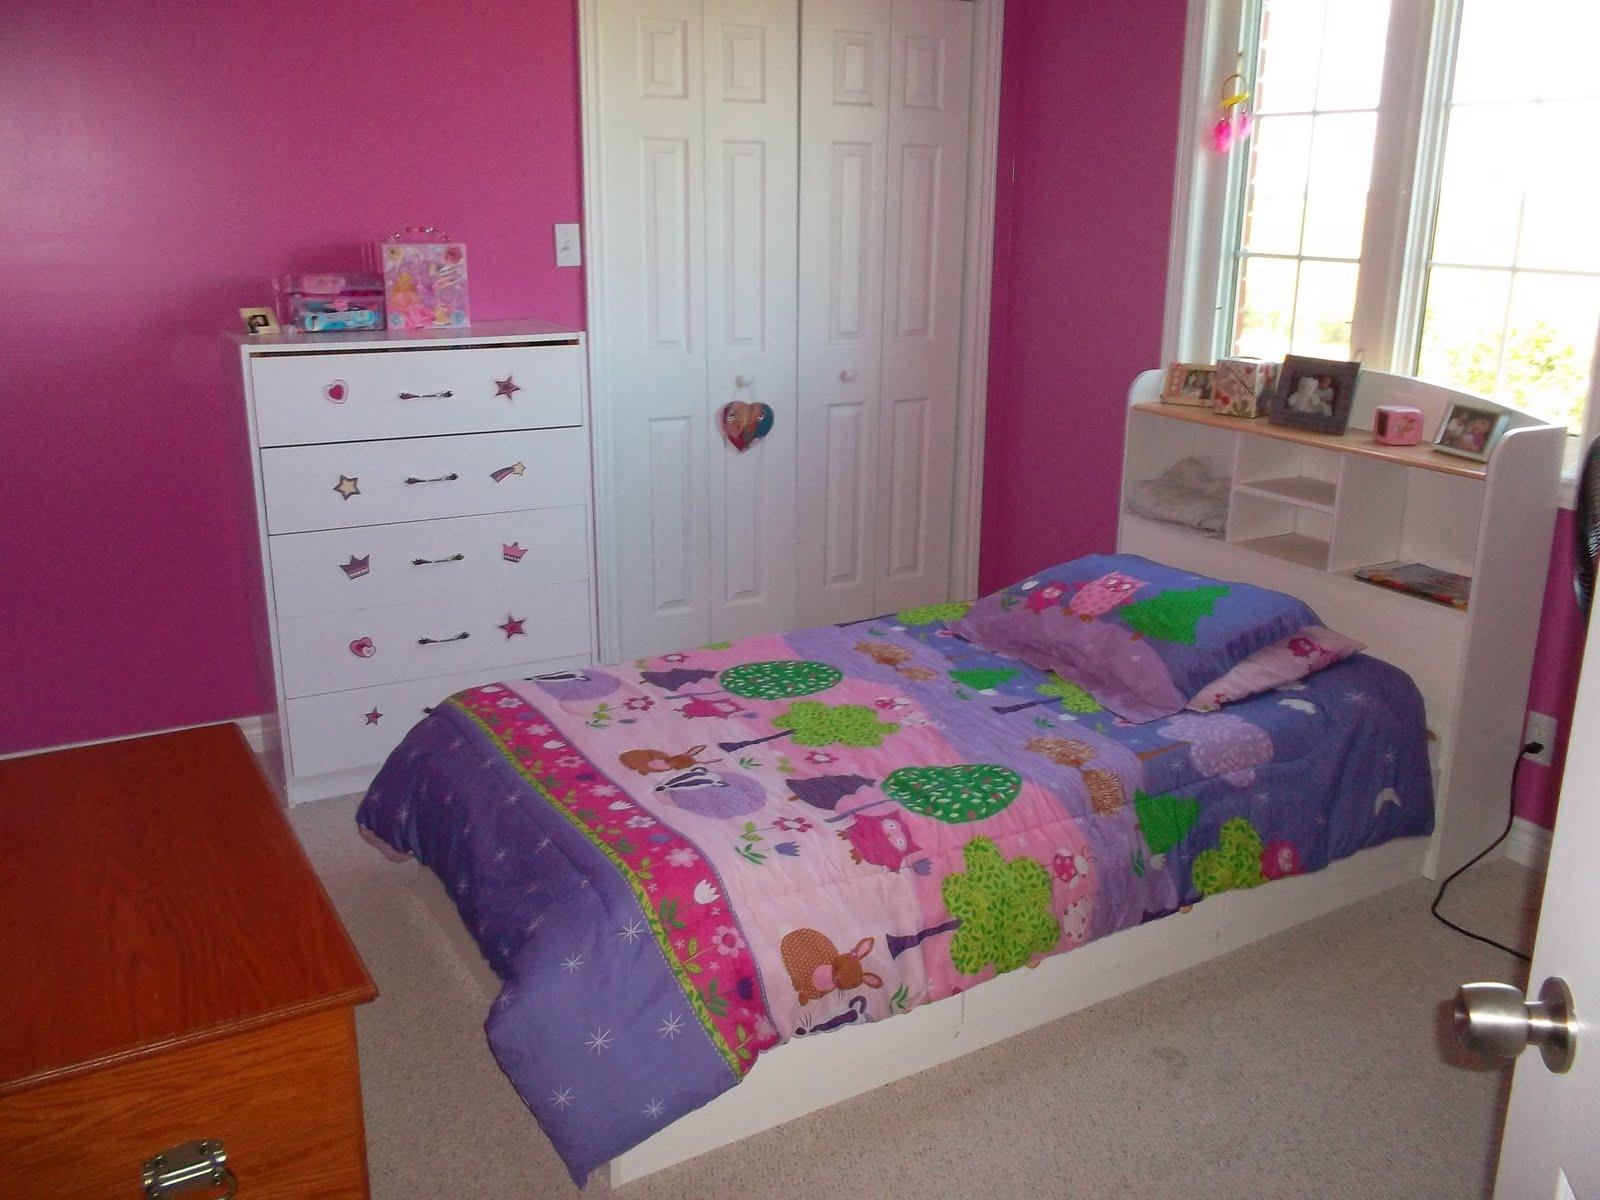 http://3.bp.blogspot.com/-_np5f_5iBno/ThIR_wI2FSI/AAAAAAAAA2c/q7SuOhqRp88/s1600/Frannie%2527s+room.JPG